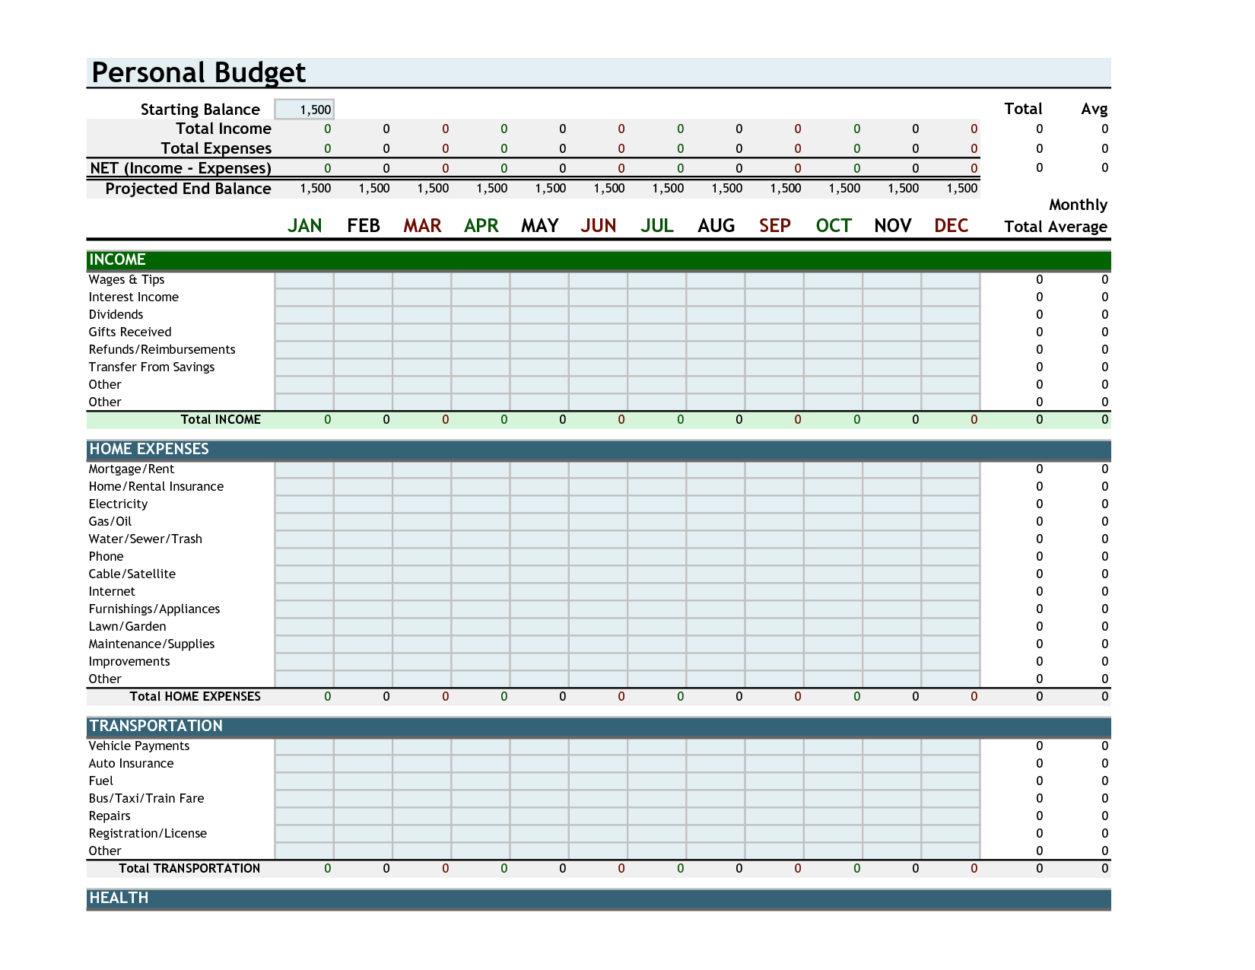 Budget Spreadsheet Australia Regarding Budget Spreadsheet Excel Reddit Free Australia Calculator Uk